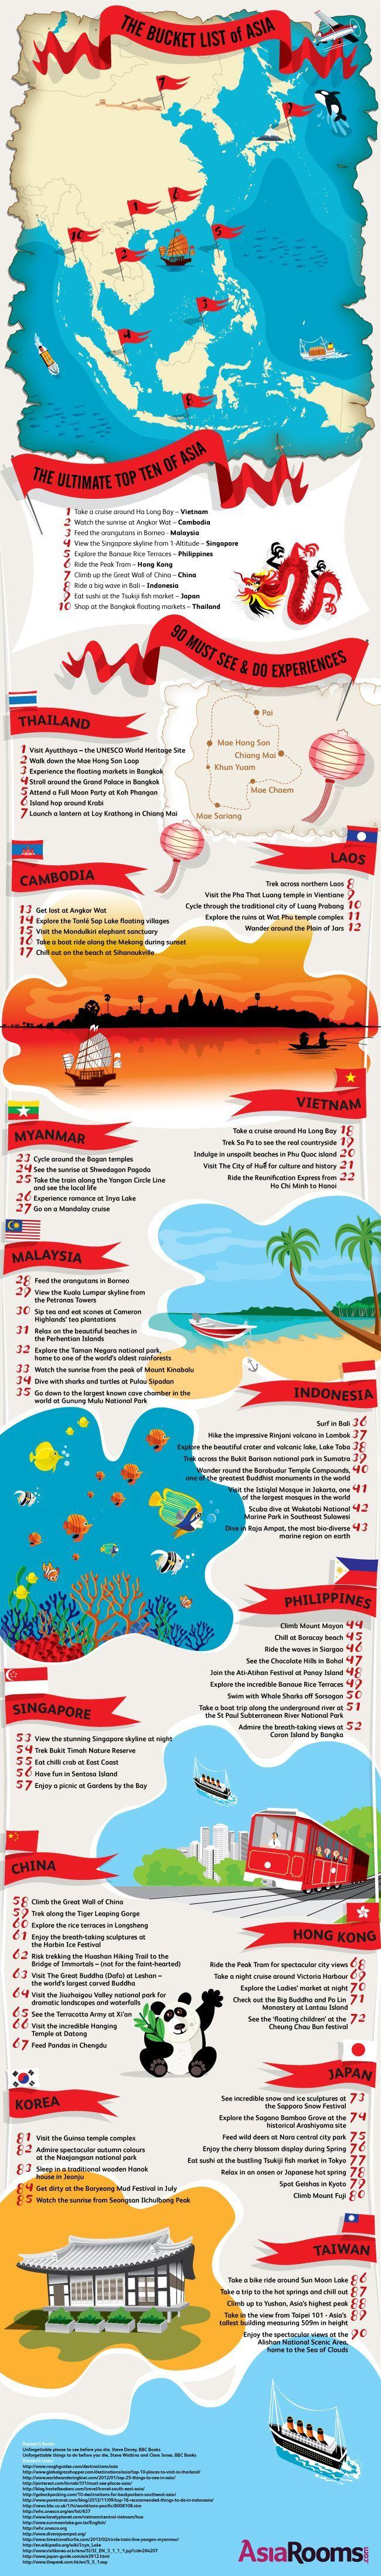 Aafebddd Bucket List Southeast Asia